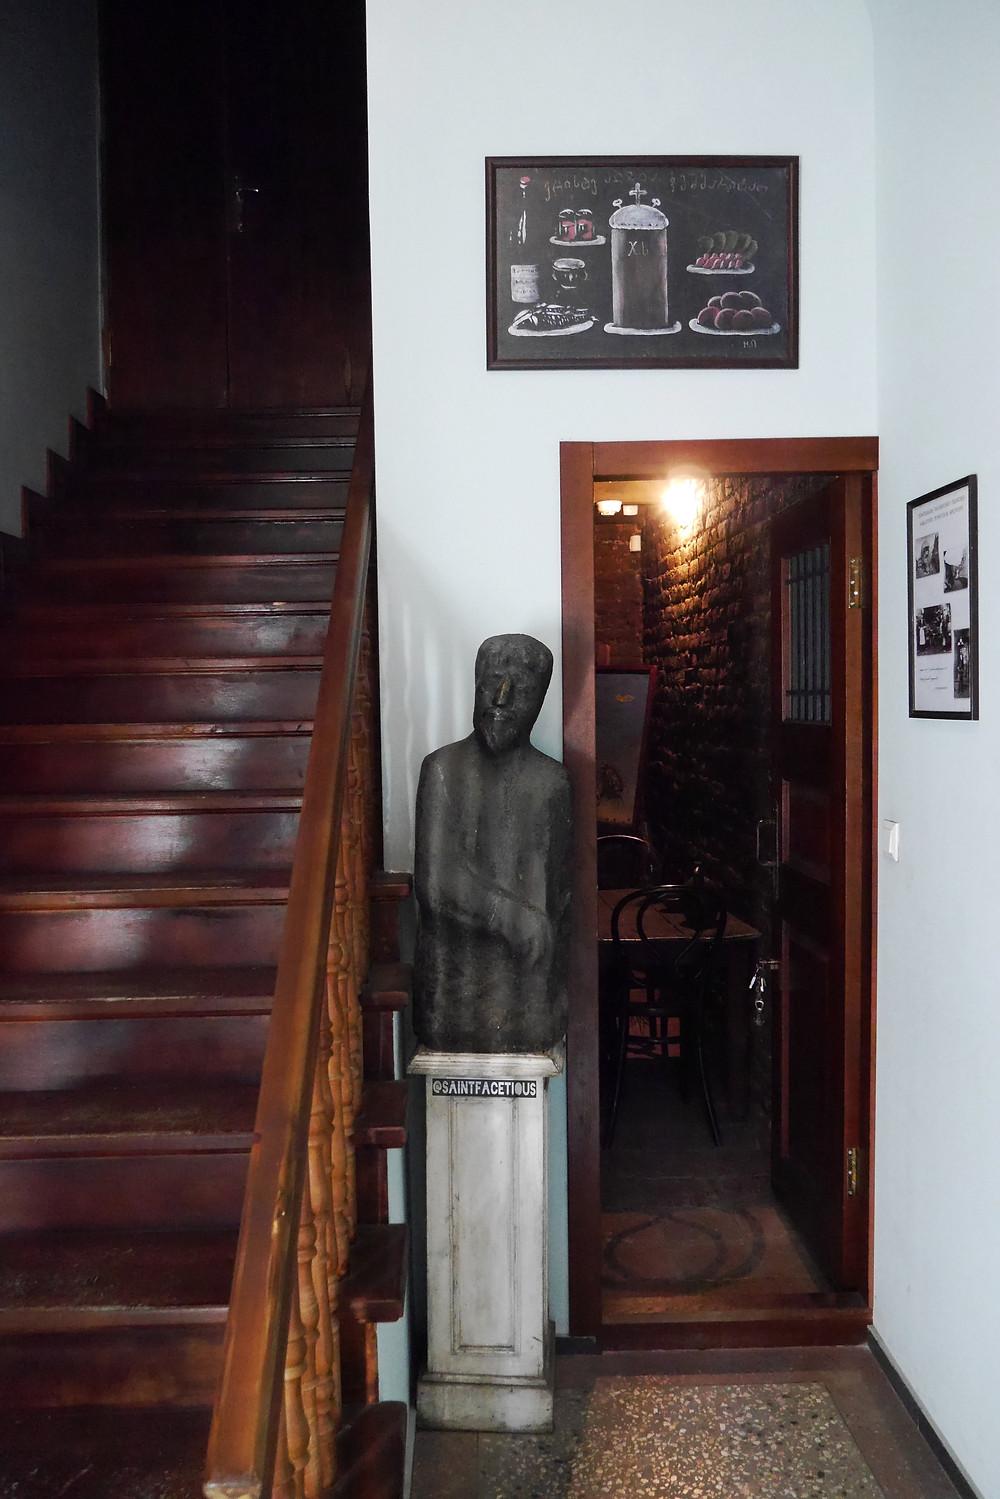 Pirosmani Museum